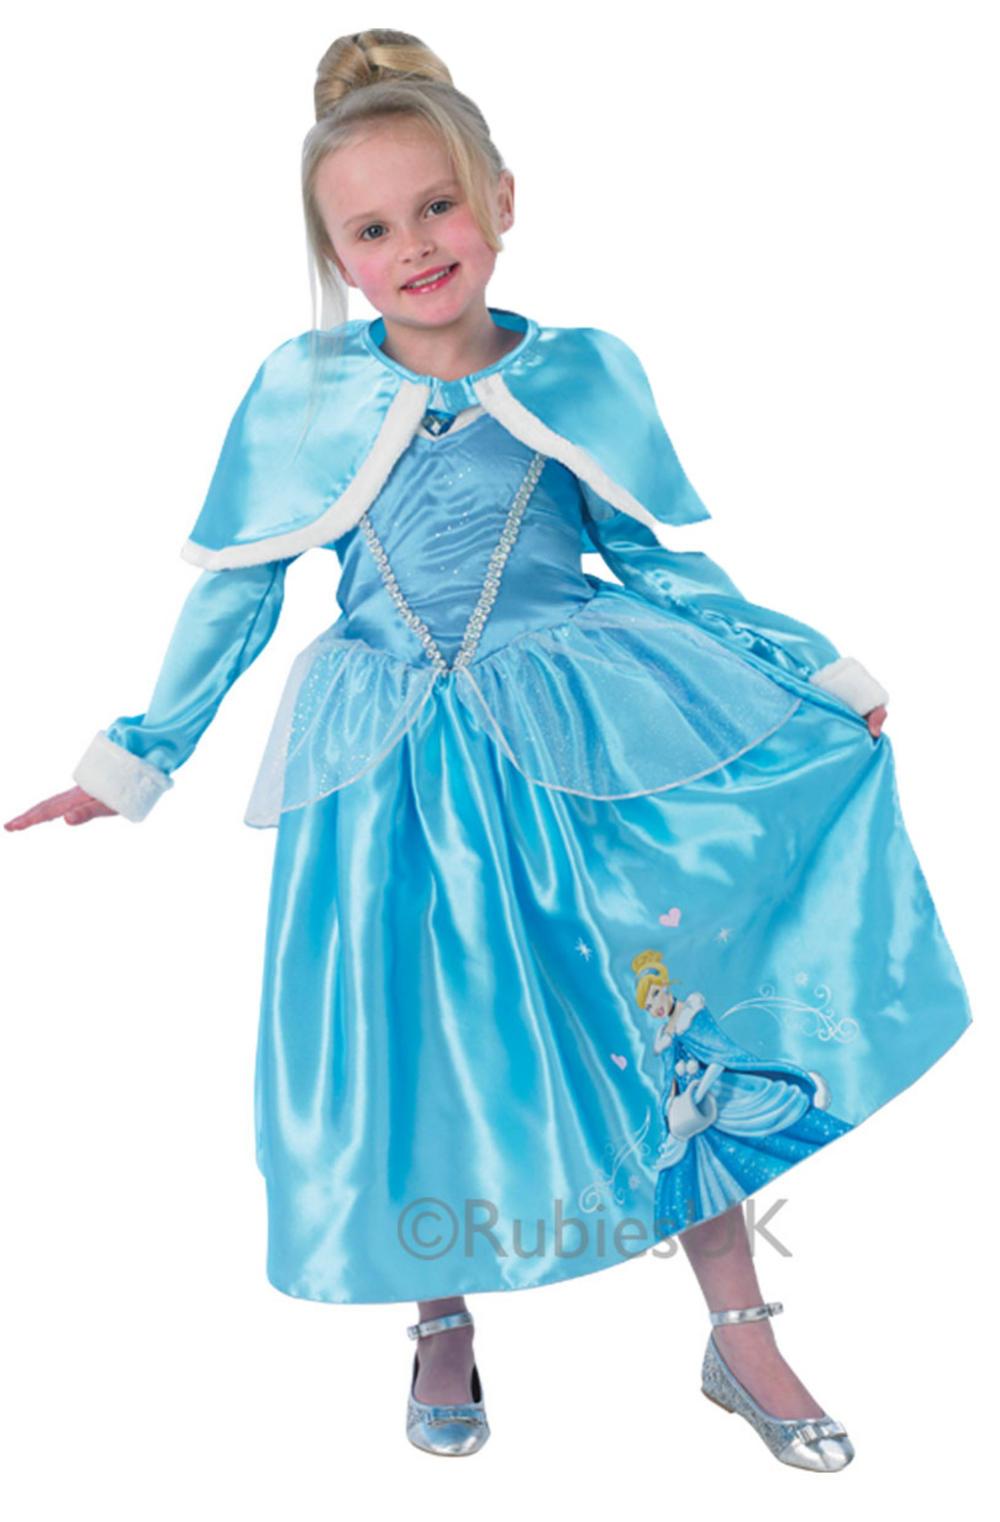 c70d6dbfde66 Disney Cinderella Princess Costume   Girl's World Book Day Fancy Dress  Costumes   Mega Fancy Dress